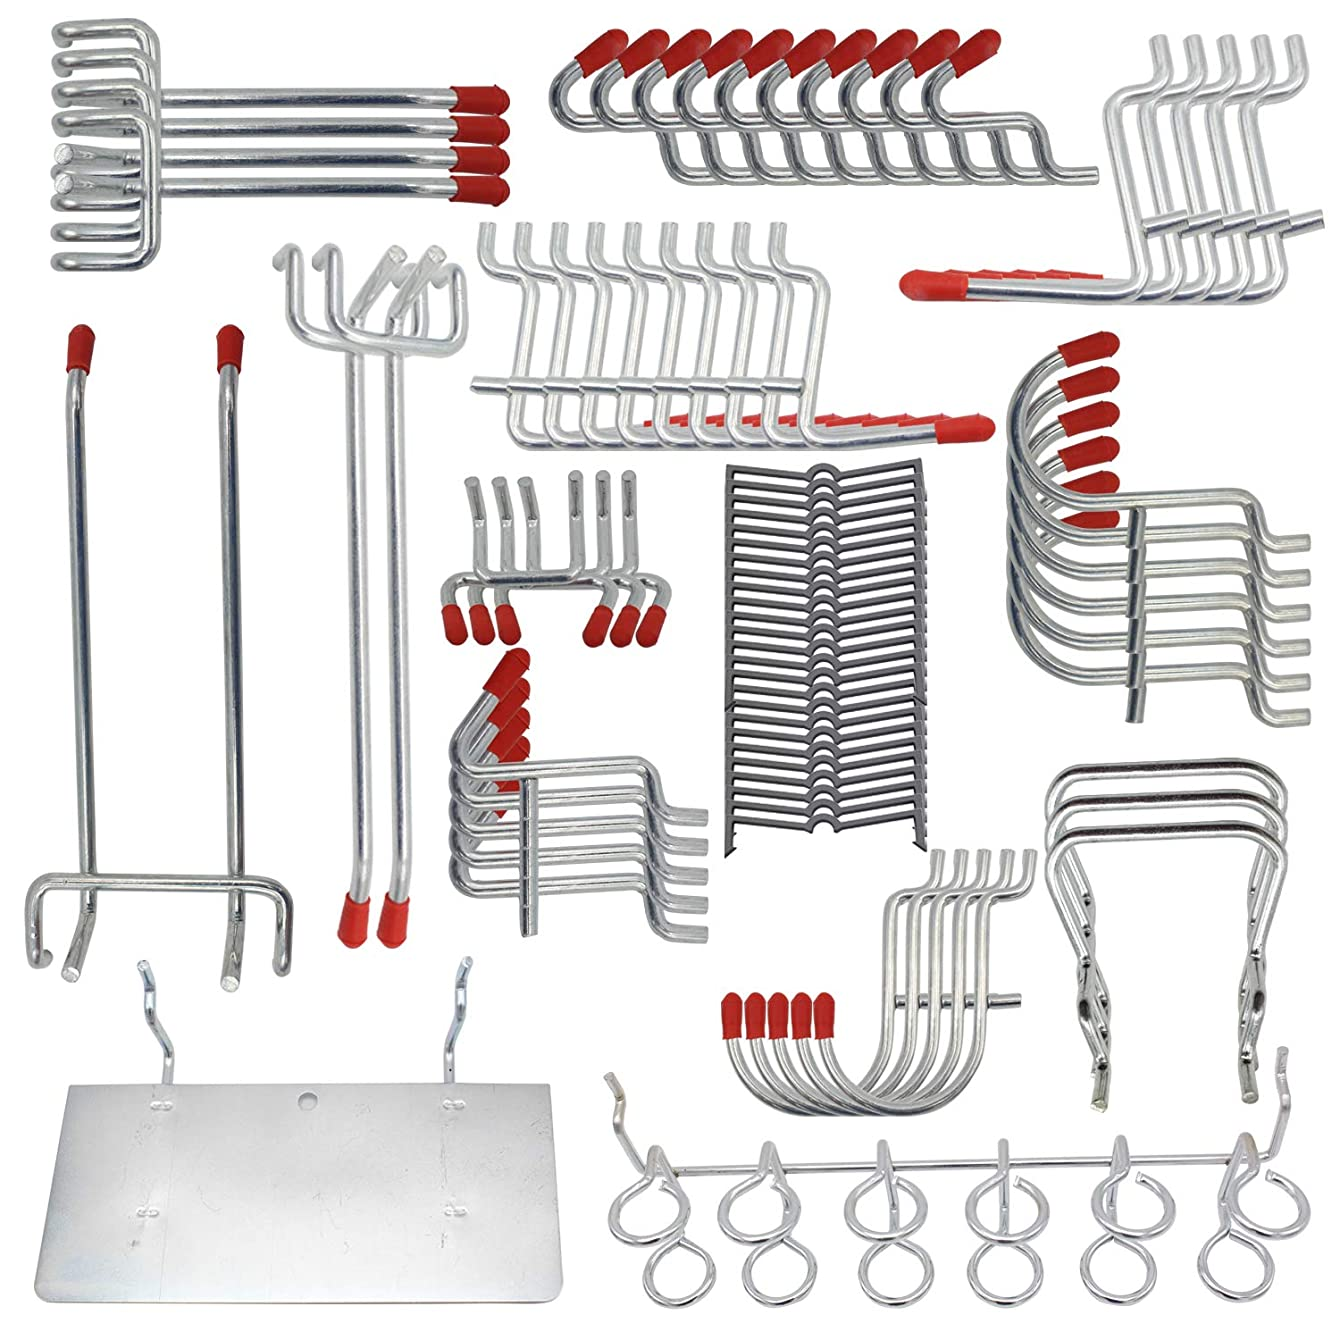 170 PCS Metal Pegboard Hooks Assortment Peg Board Storage System Peg Board Accessories Set For Garage Kitchen Workshop Utility Hooks Include Black Peg Locks